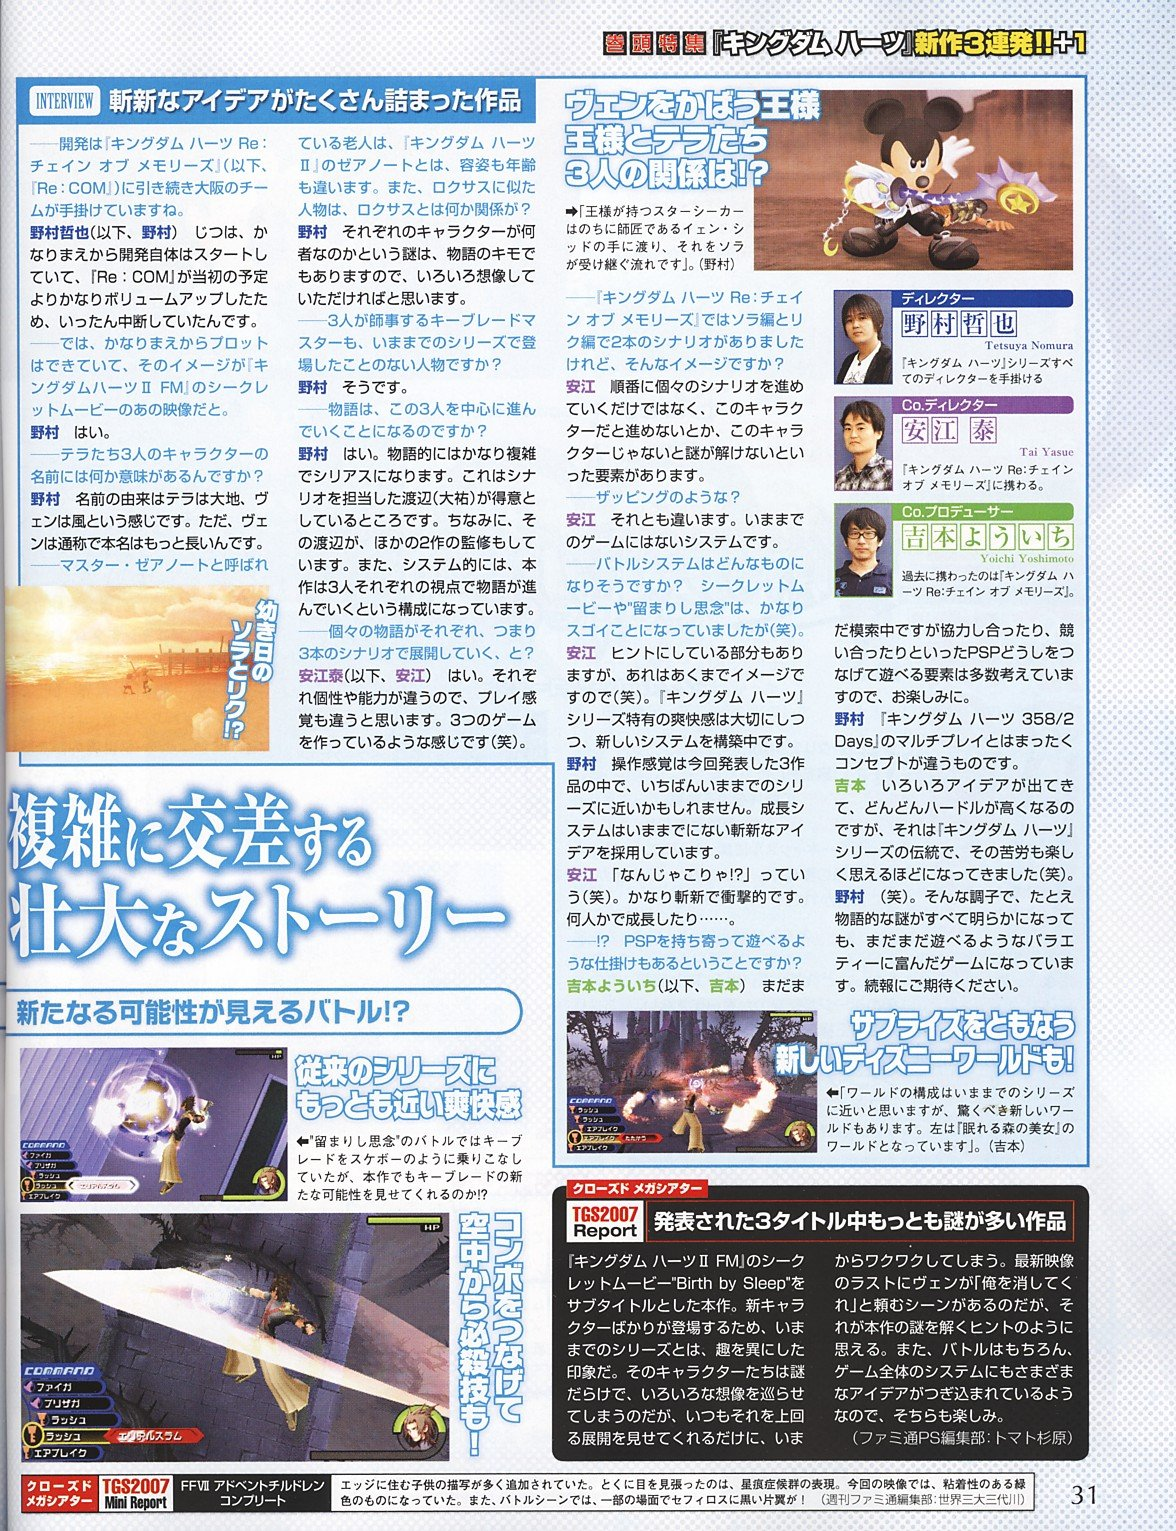 Des scans pour Kingdom Hearts 358/2 Days et Birth By Sleep!